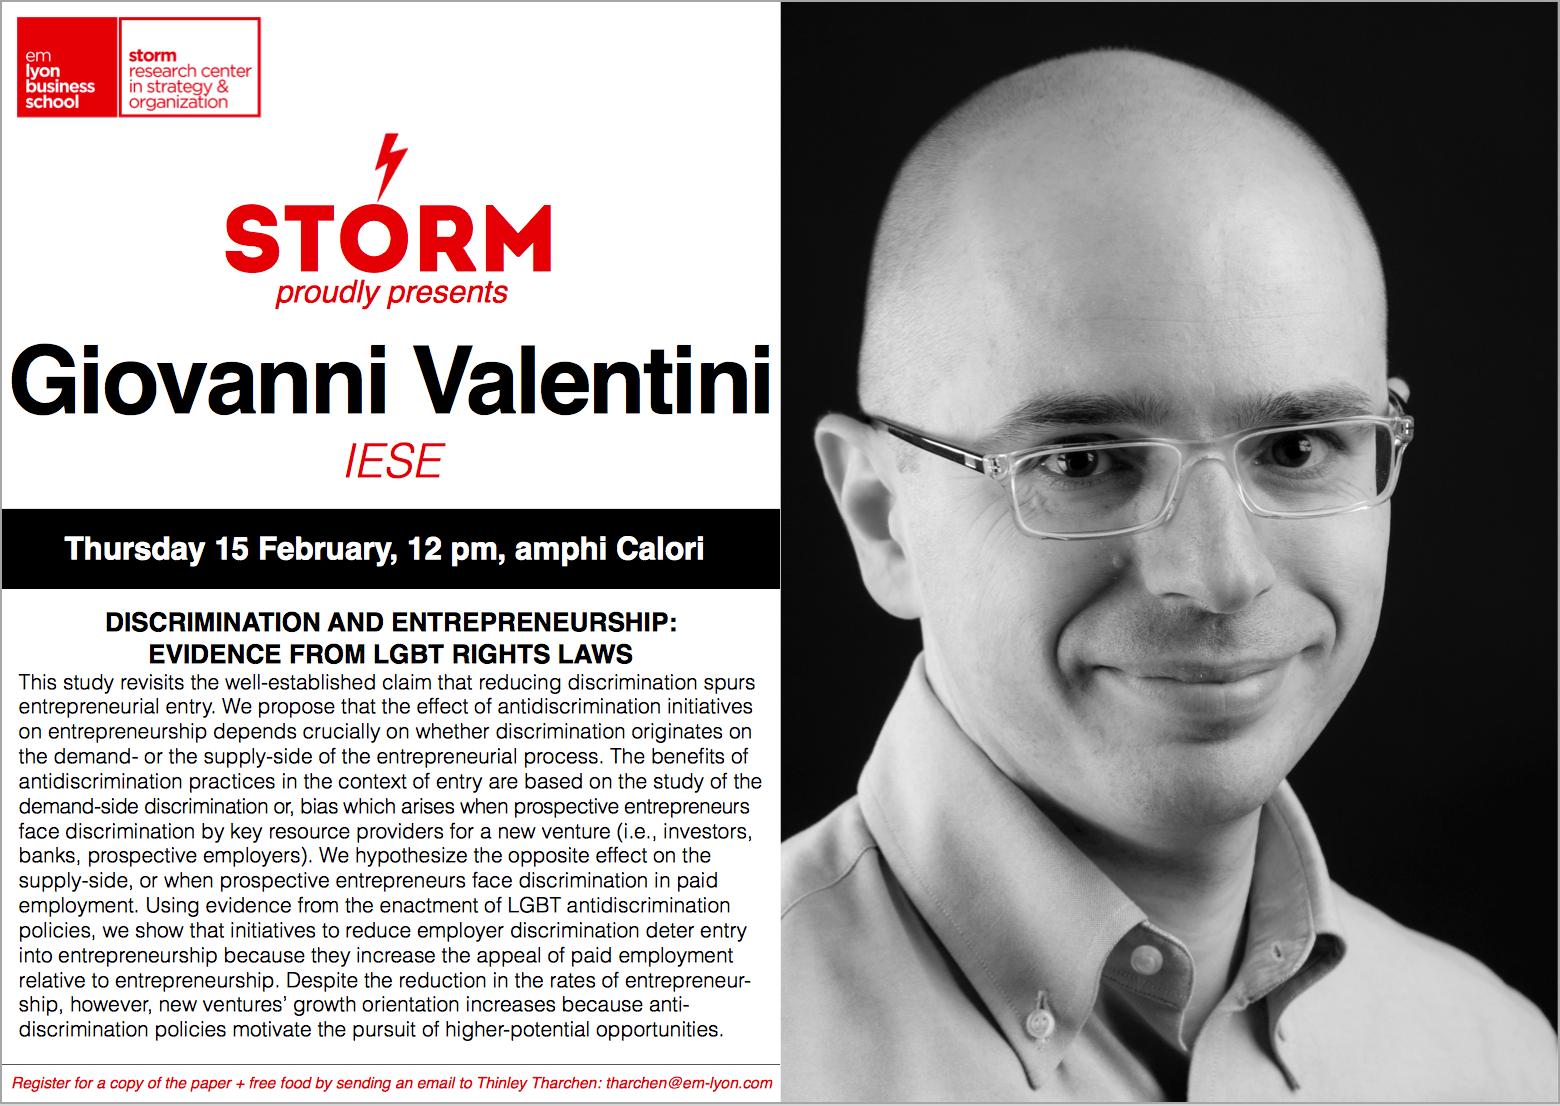 15 February 2018: GIOVANNI VALENTINI (IESE)